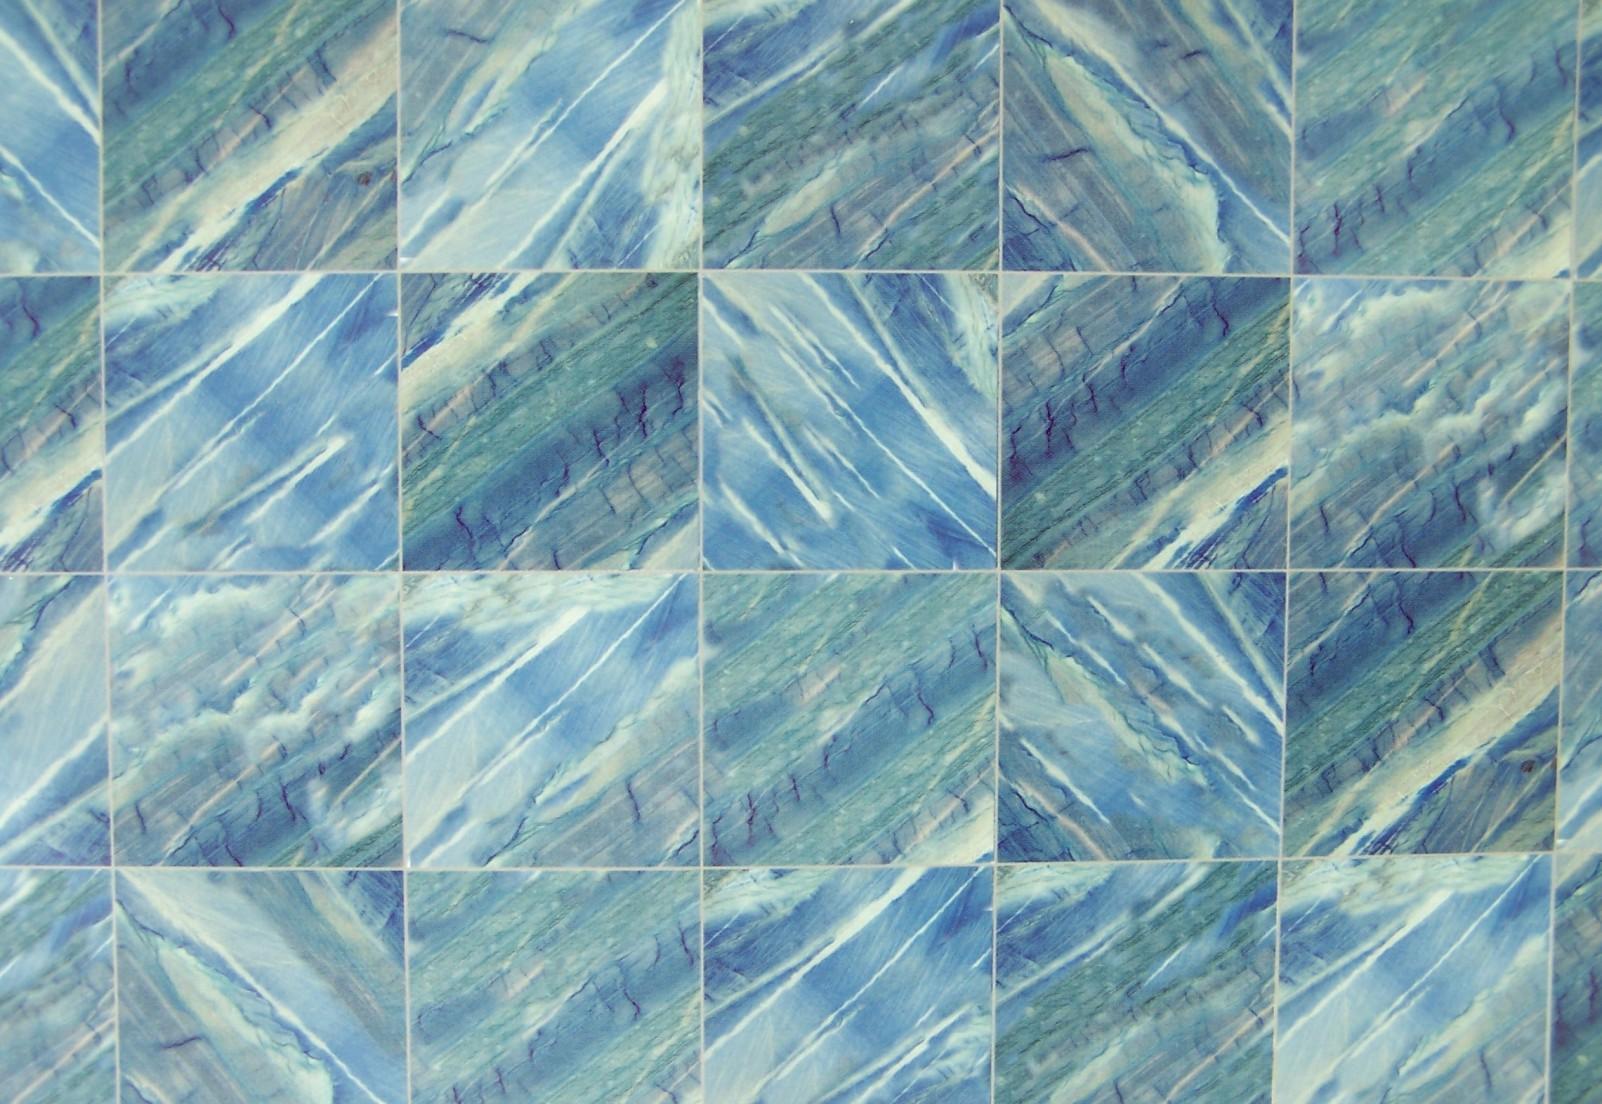 14x24 5cm 132 06eur m bodenfliesen gl nzend marmor blau. Black Bedroom Furniture Sets. Home Design Ideas